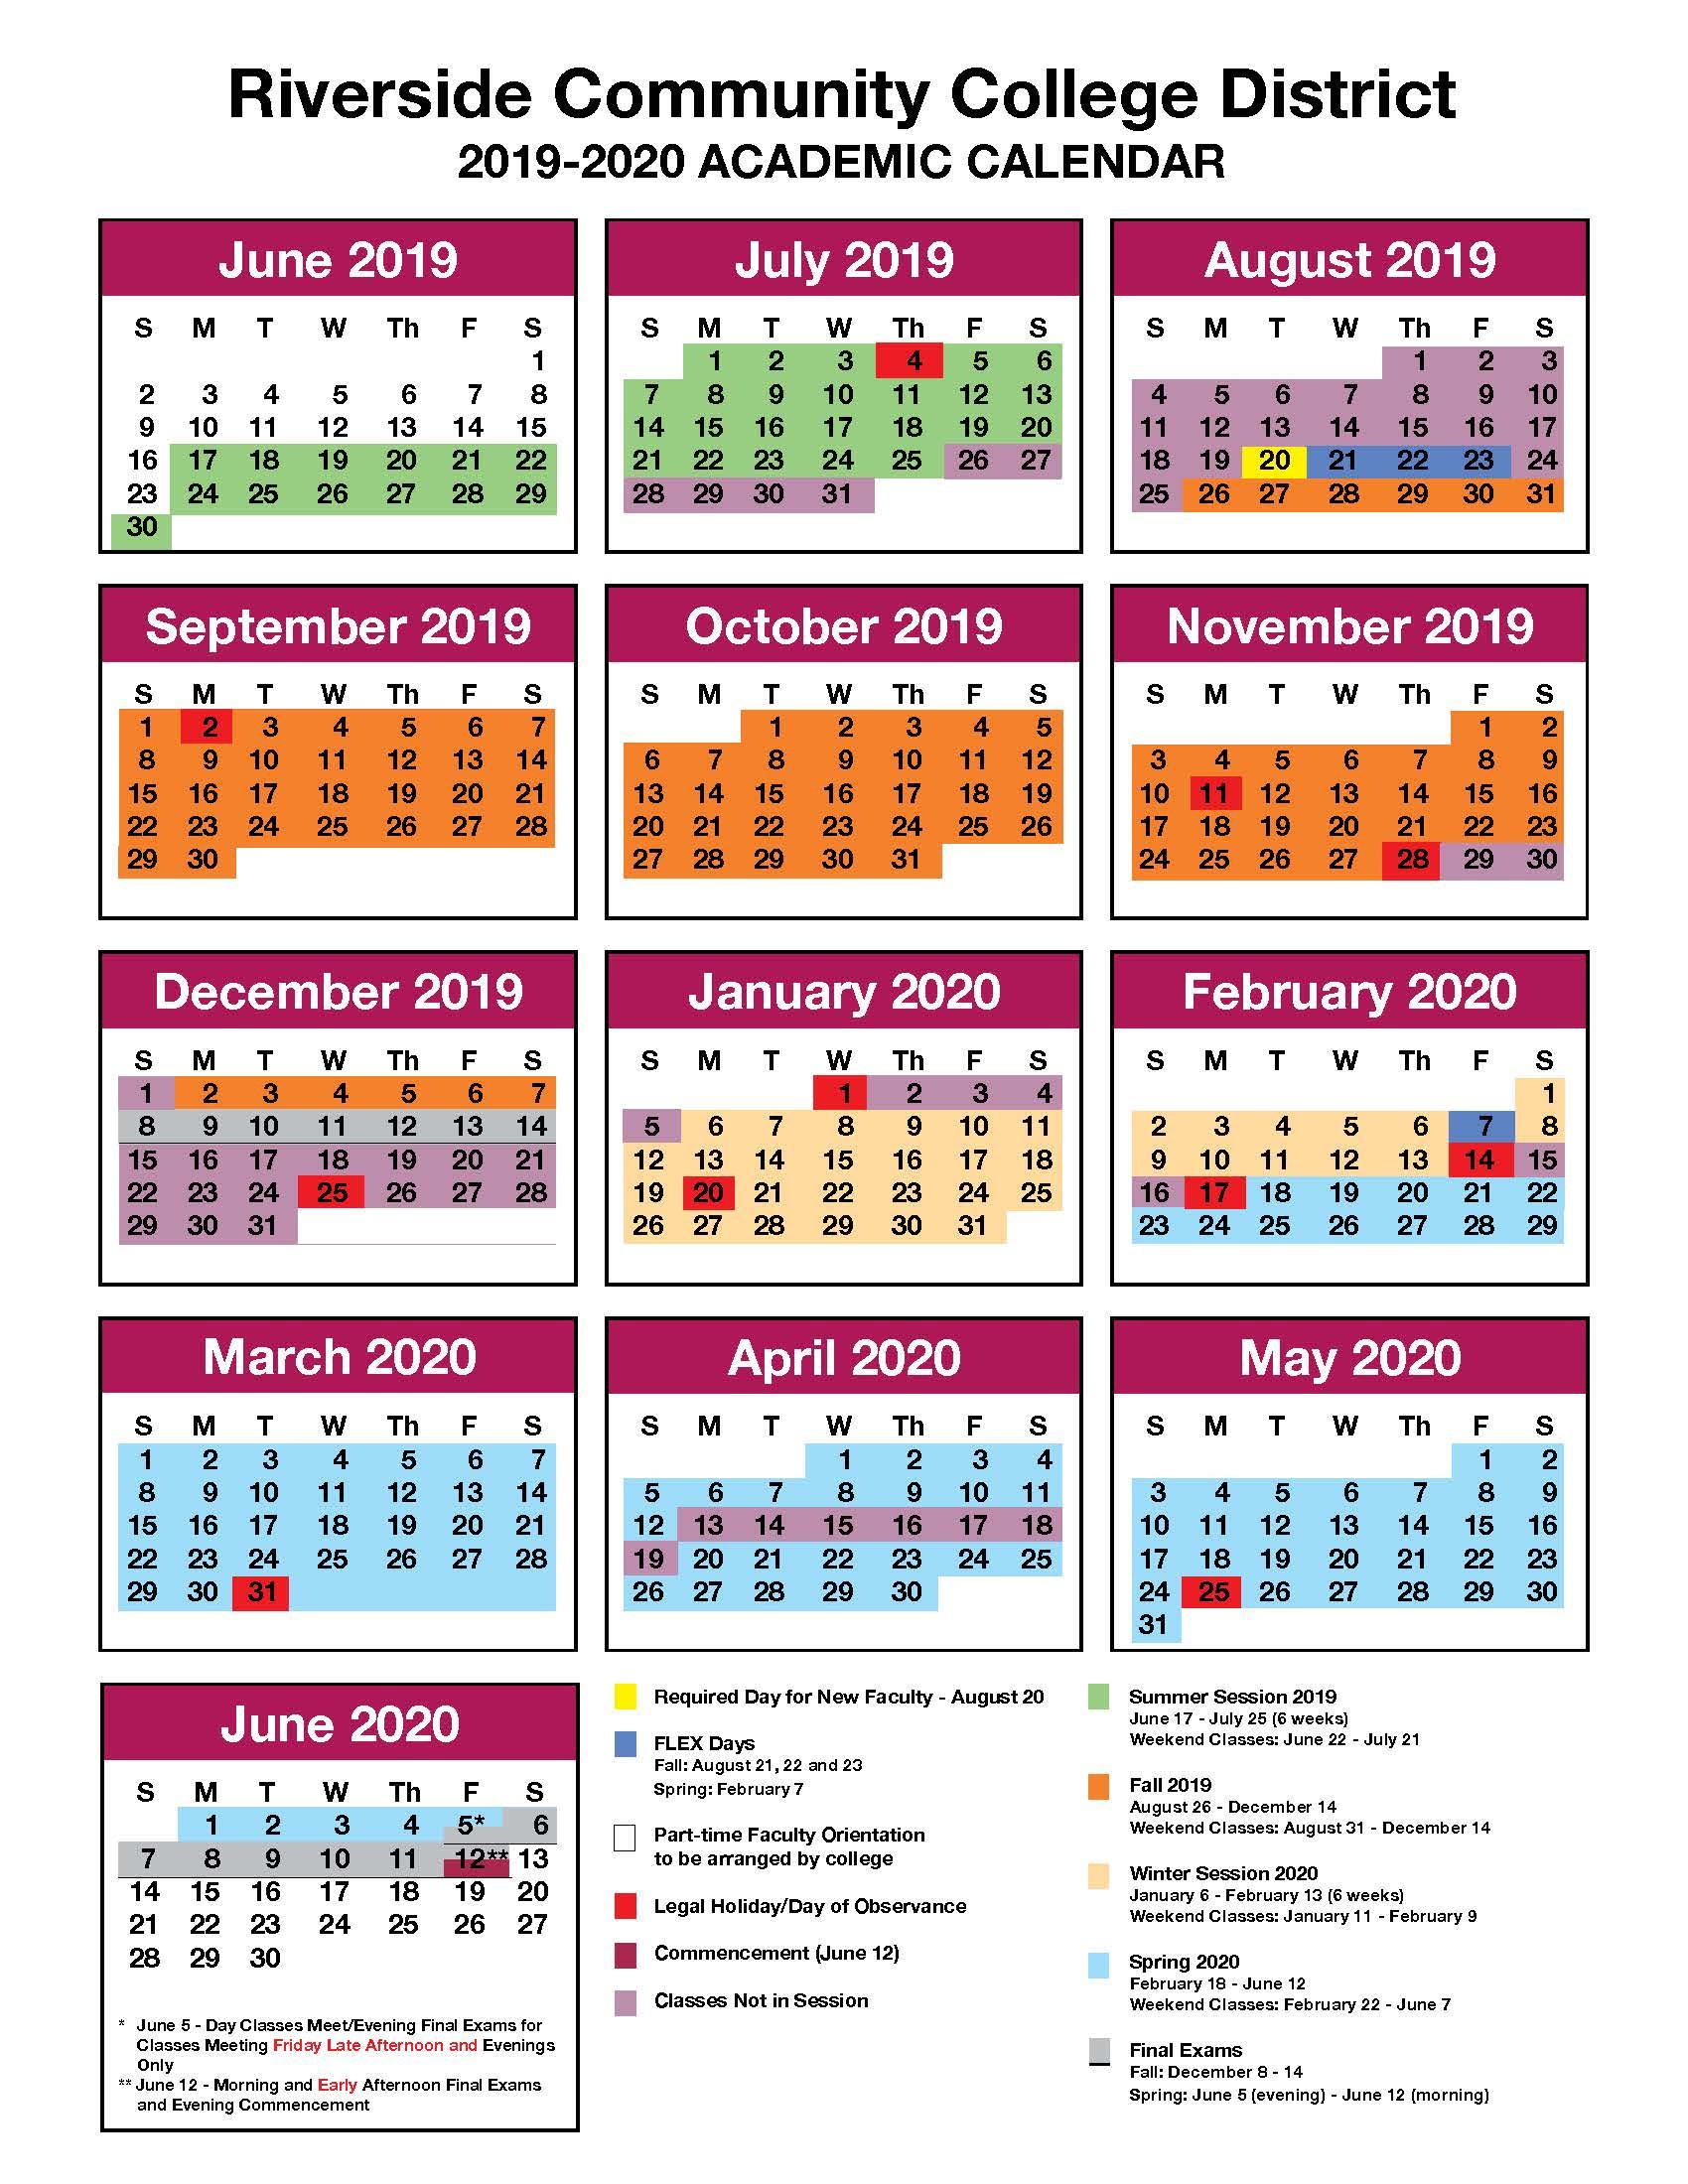 Jfk And Norco College Calendar 2019 2020 - John F. Kennedy With Regard To Laguna Beach High School Calendar